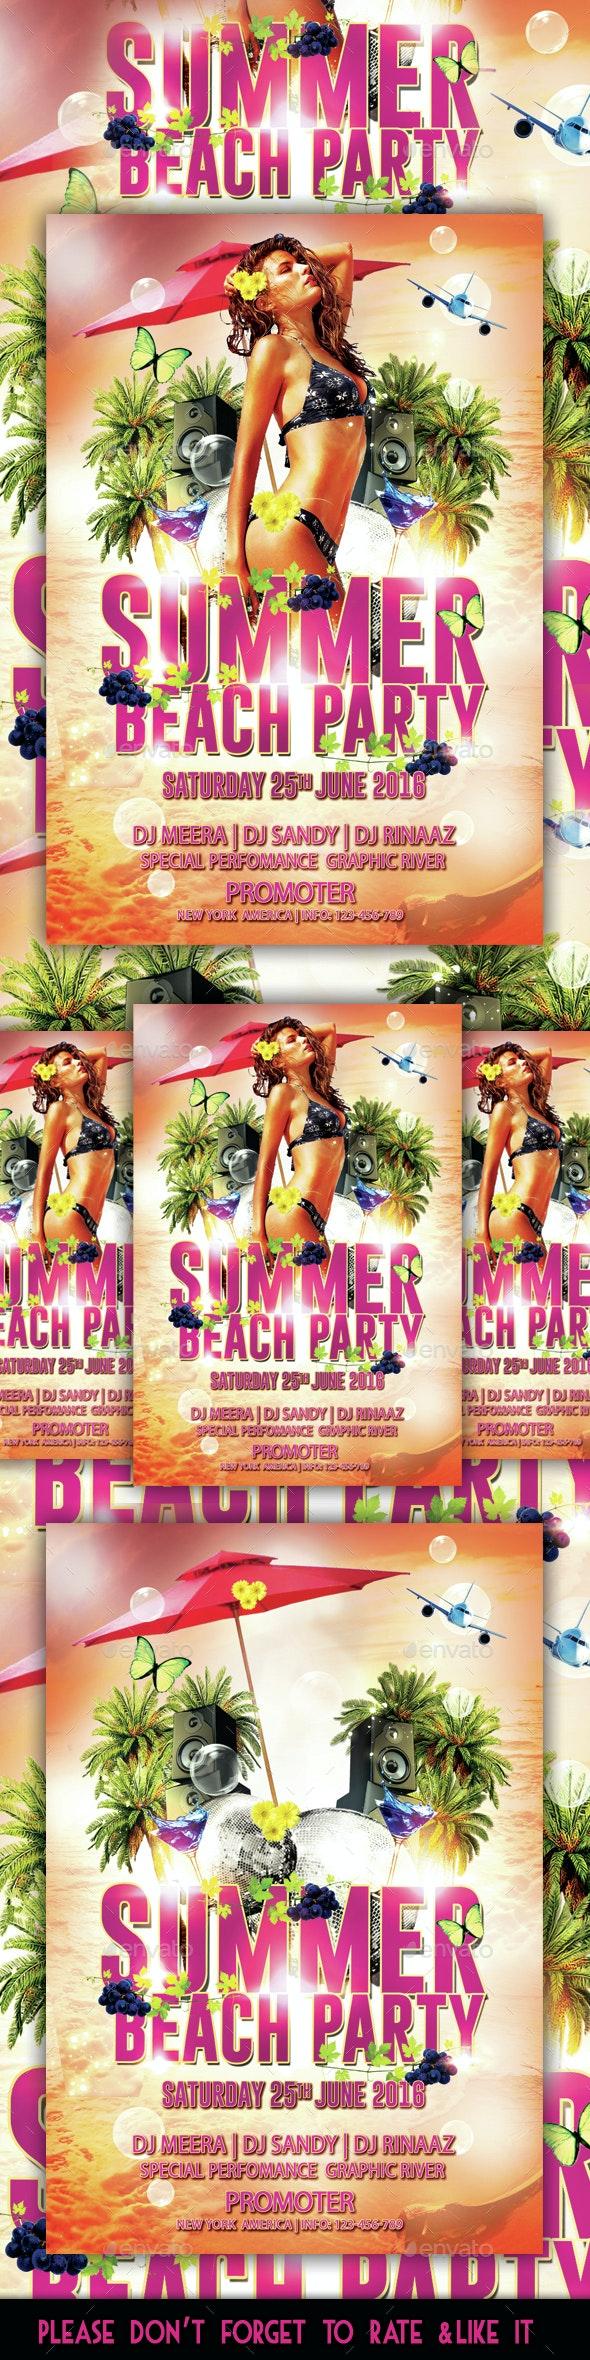 Summer Beach Party Flyer - Flyers Print Templates